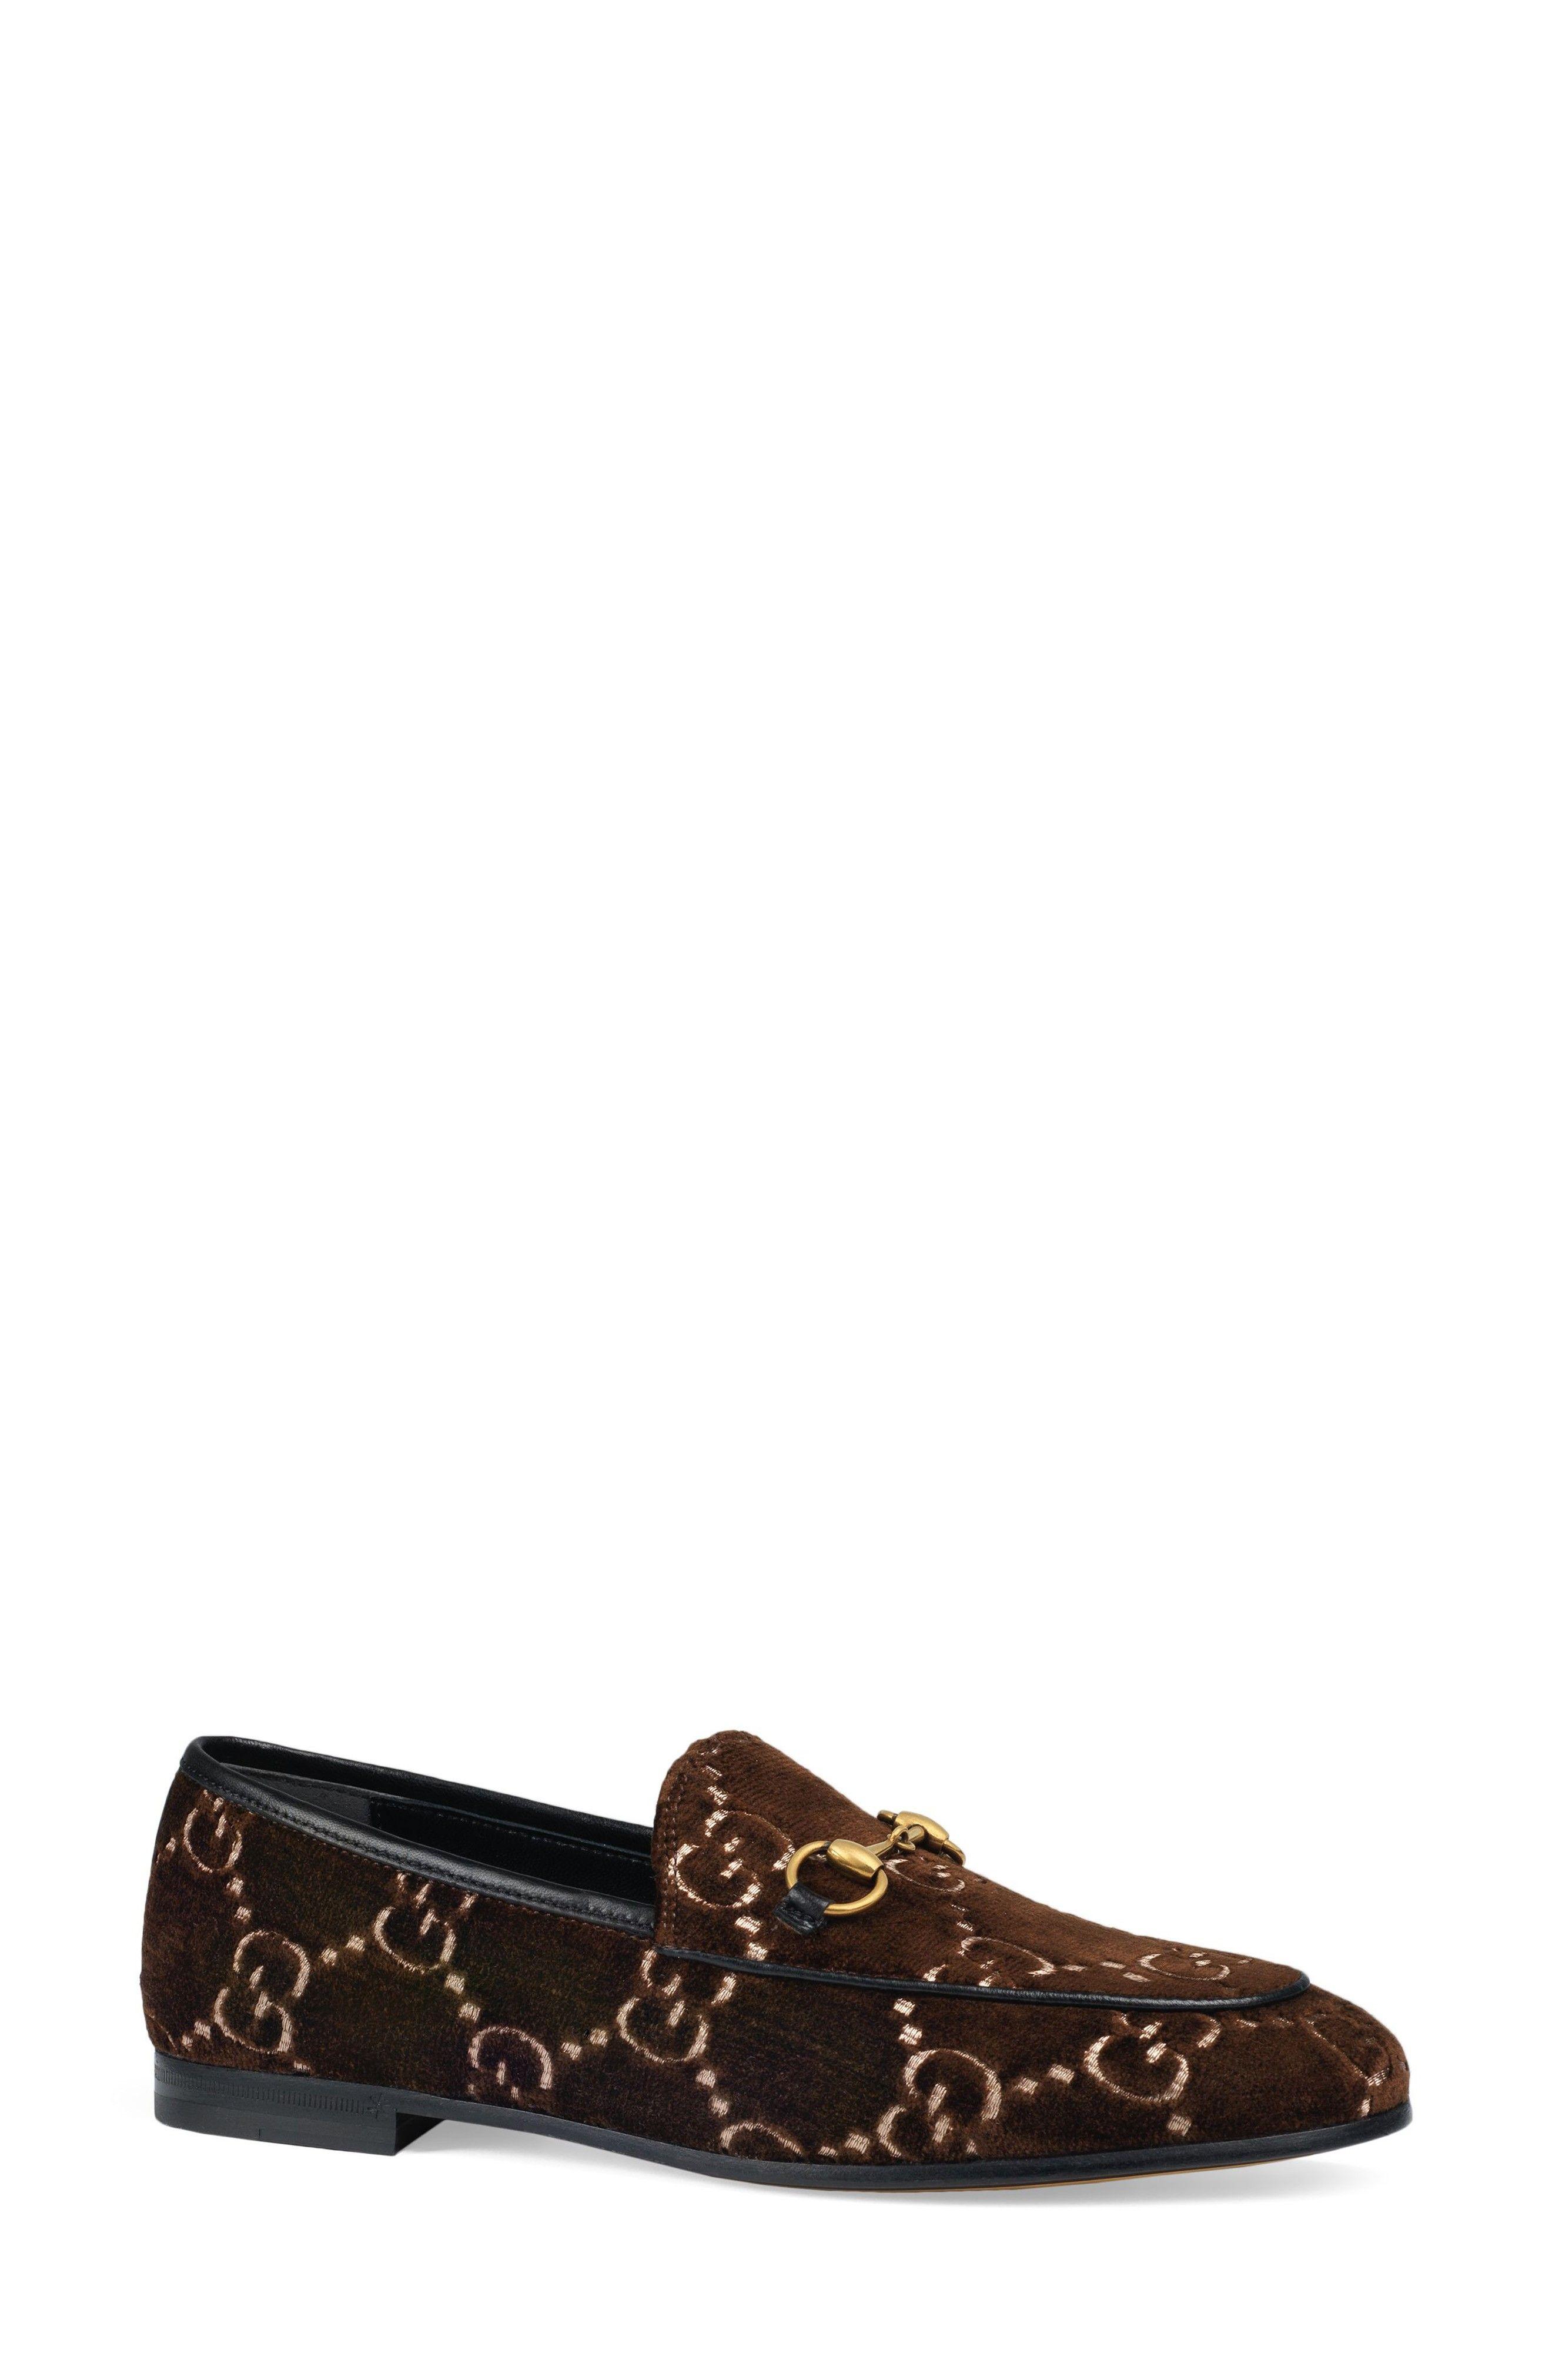 941ff129222 Buy GUCCI Jordaan Loafer online. New GUCCI Flats.   730  SKU  KMXI96195KEPE98174